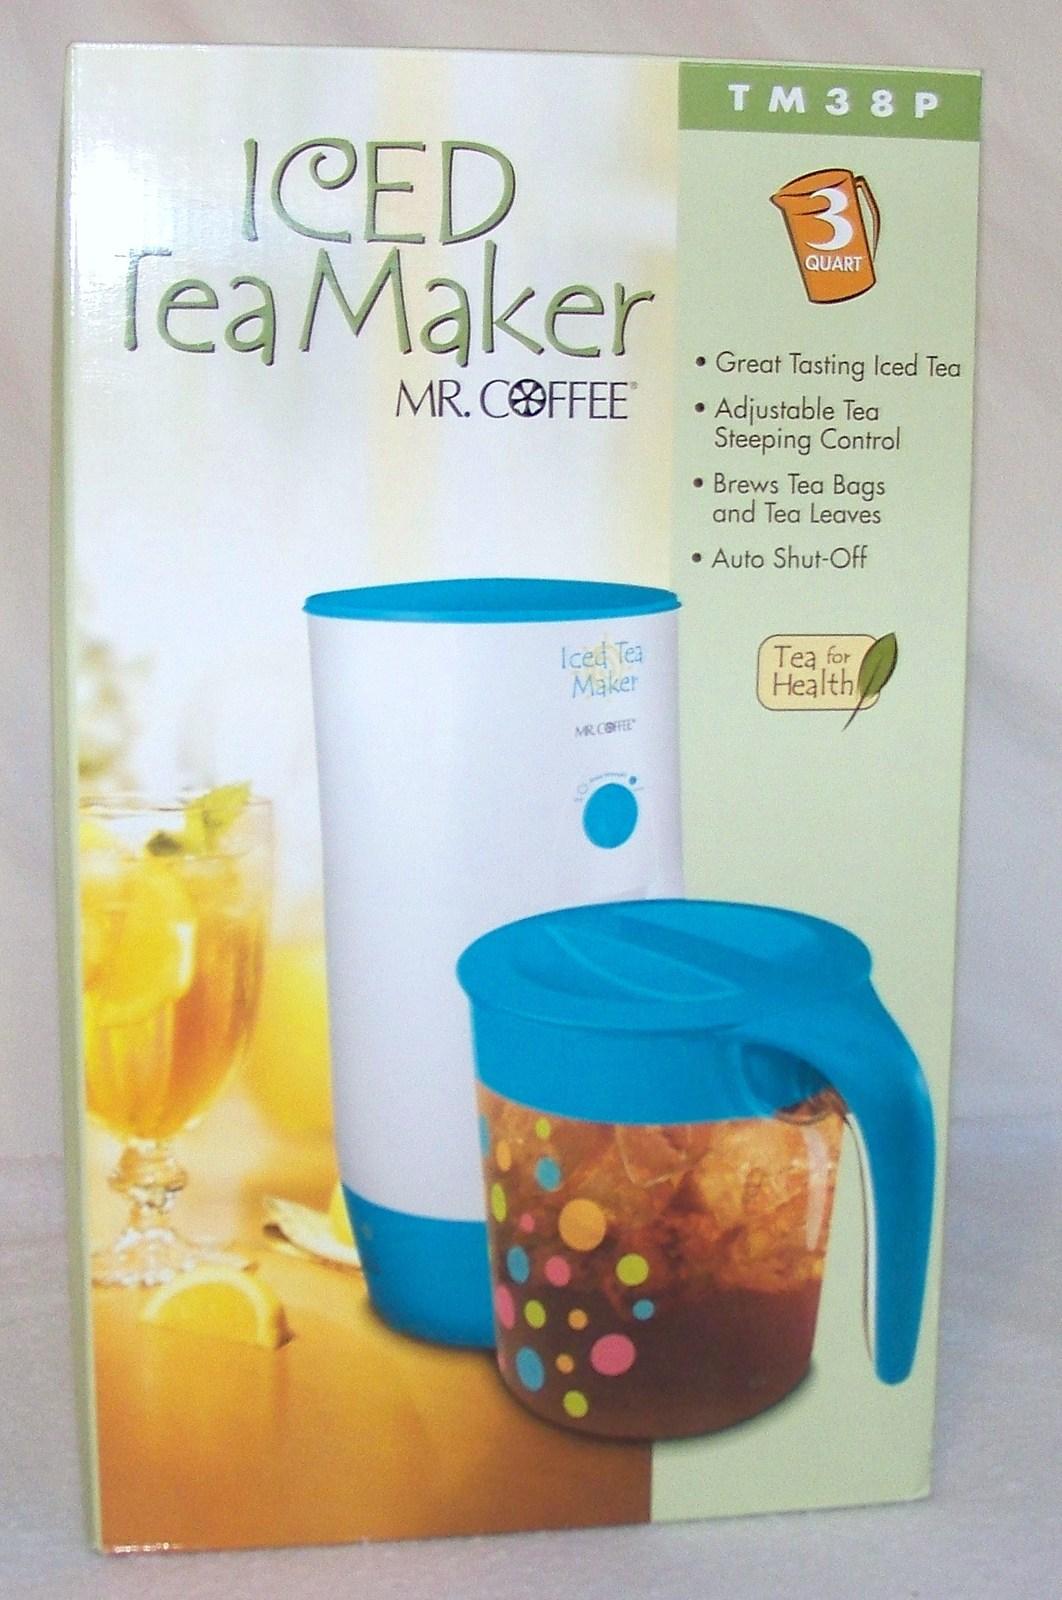 mr coffee 3 quart iced tea maker instructions